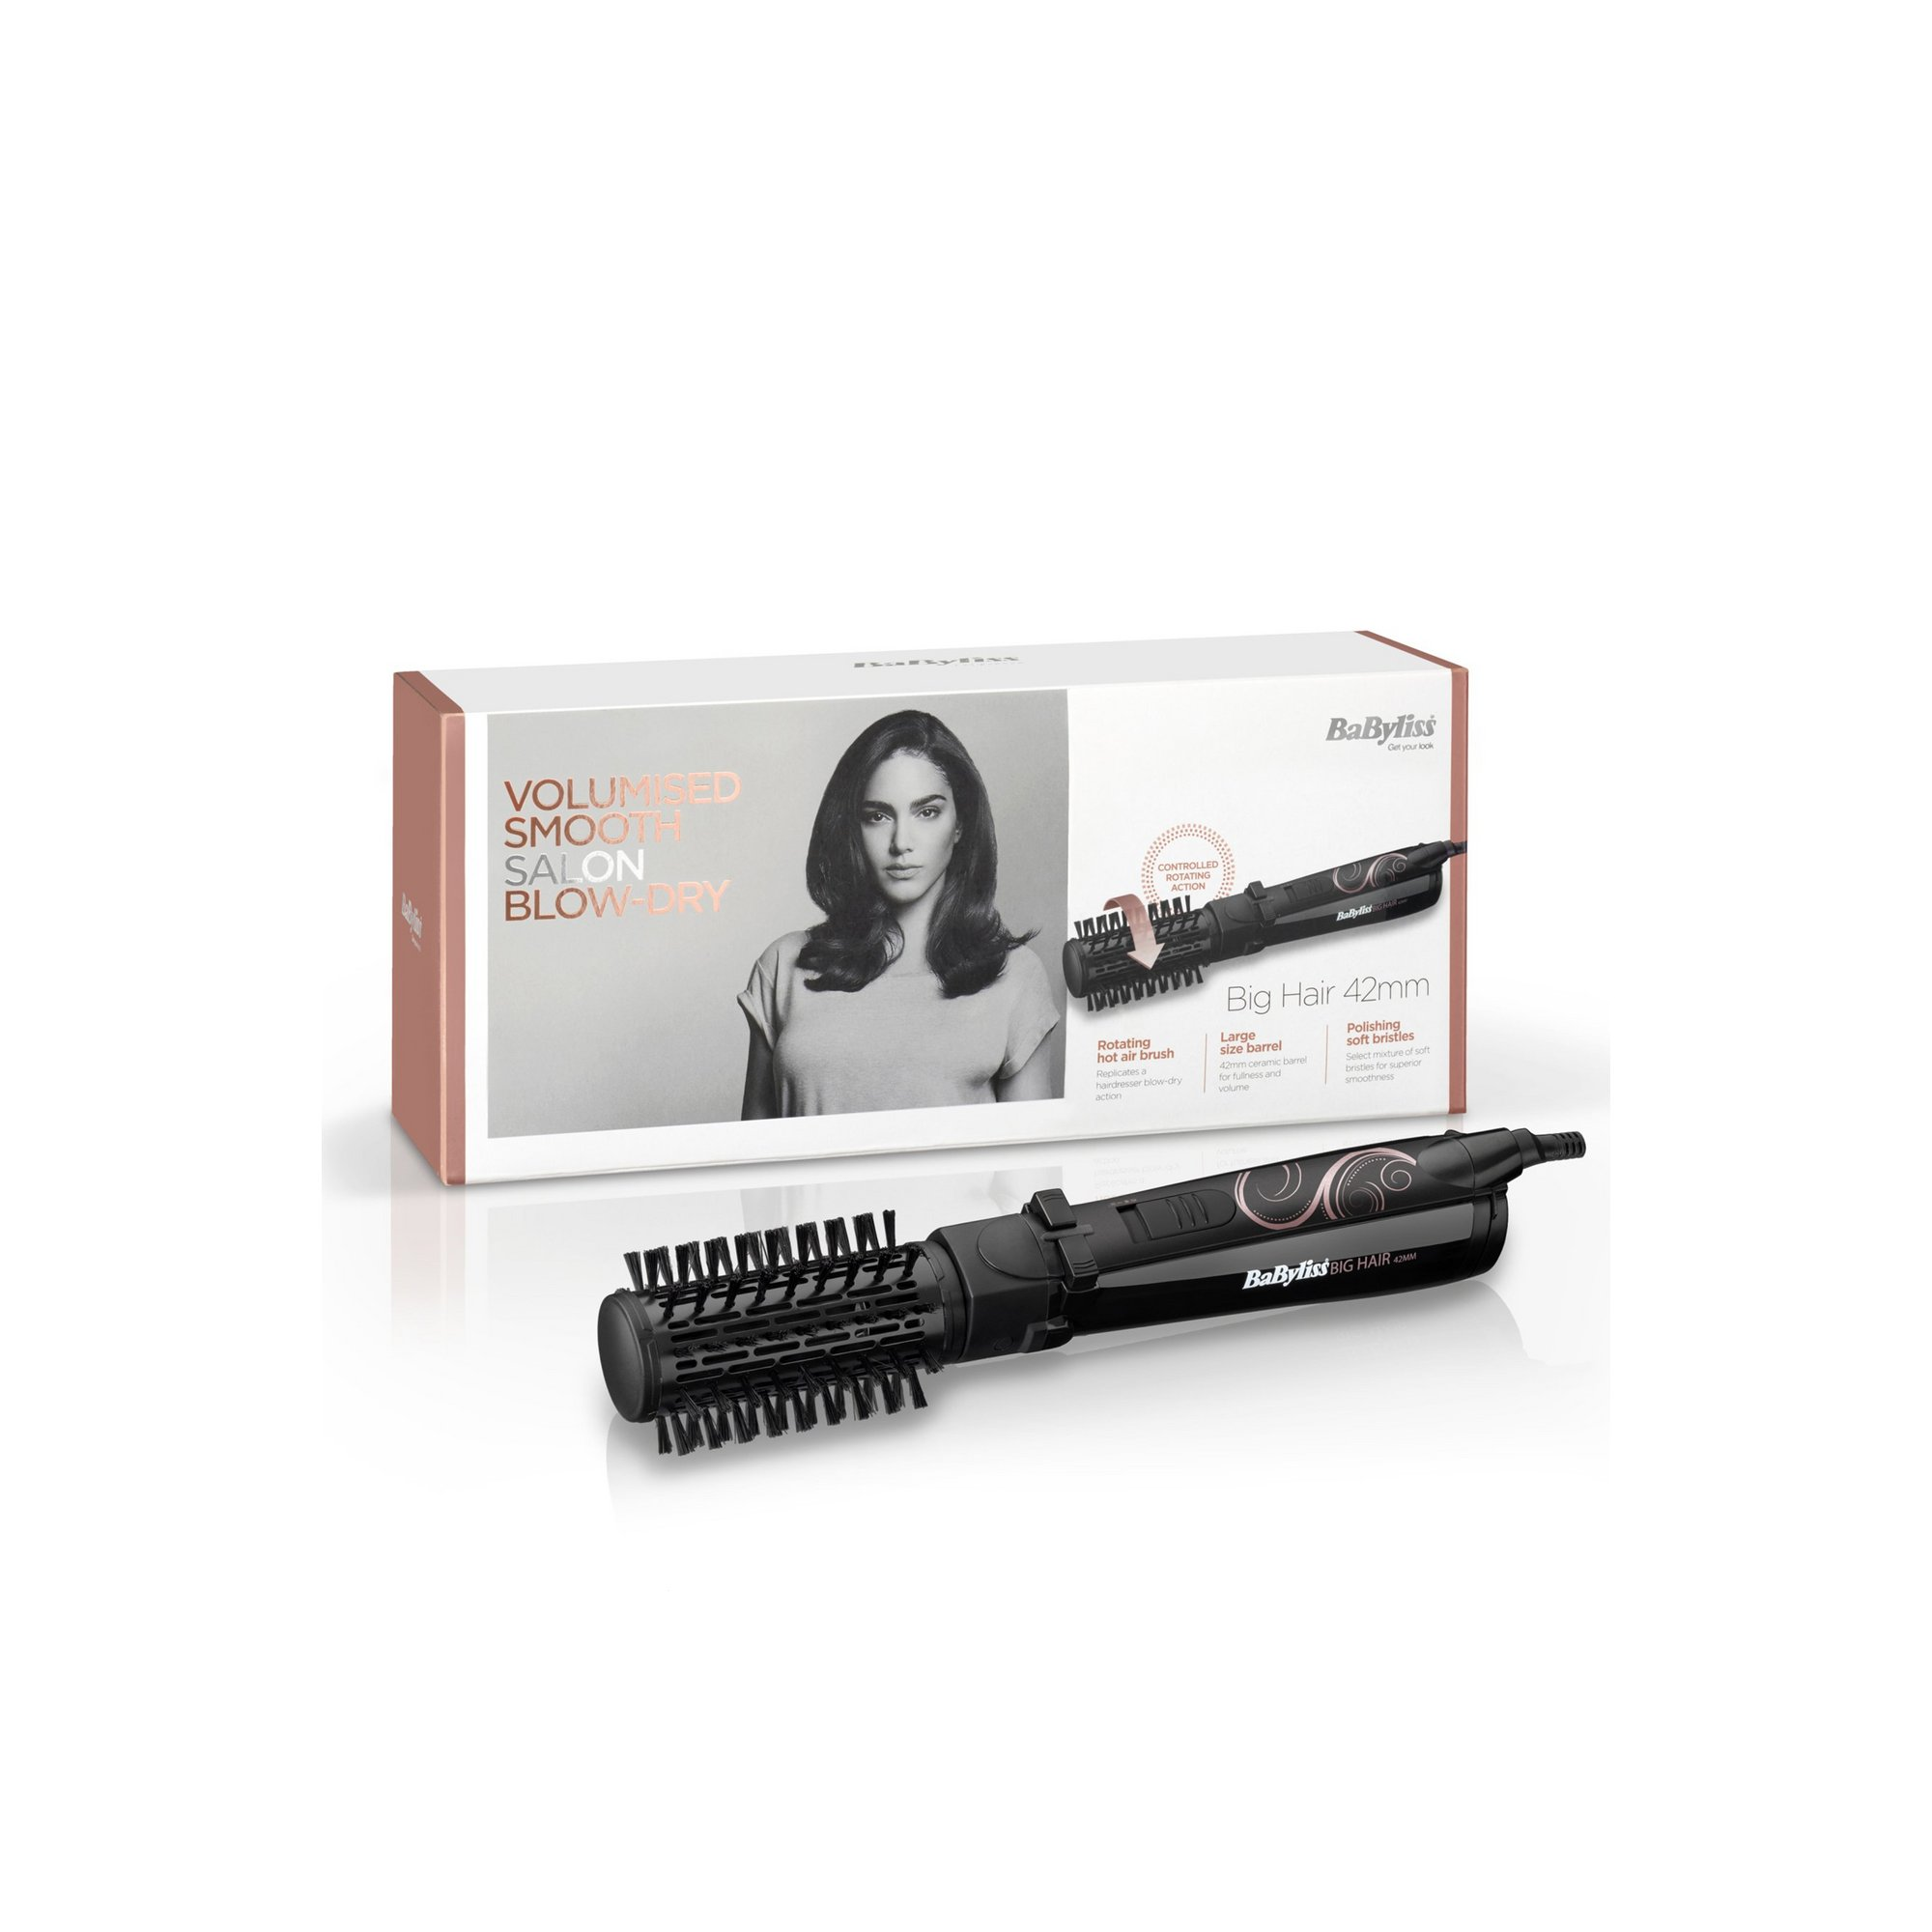 Image of BaByliss Big Hair 42mm Hot Air Brush